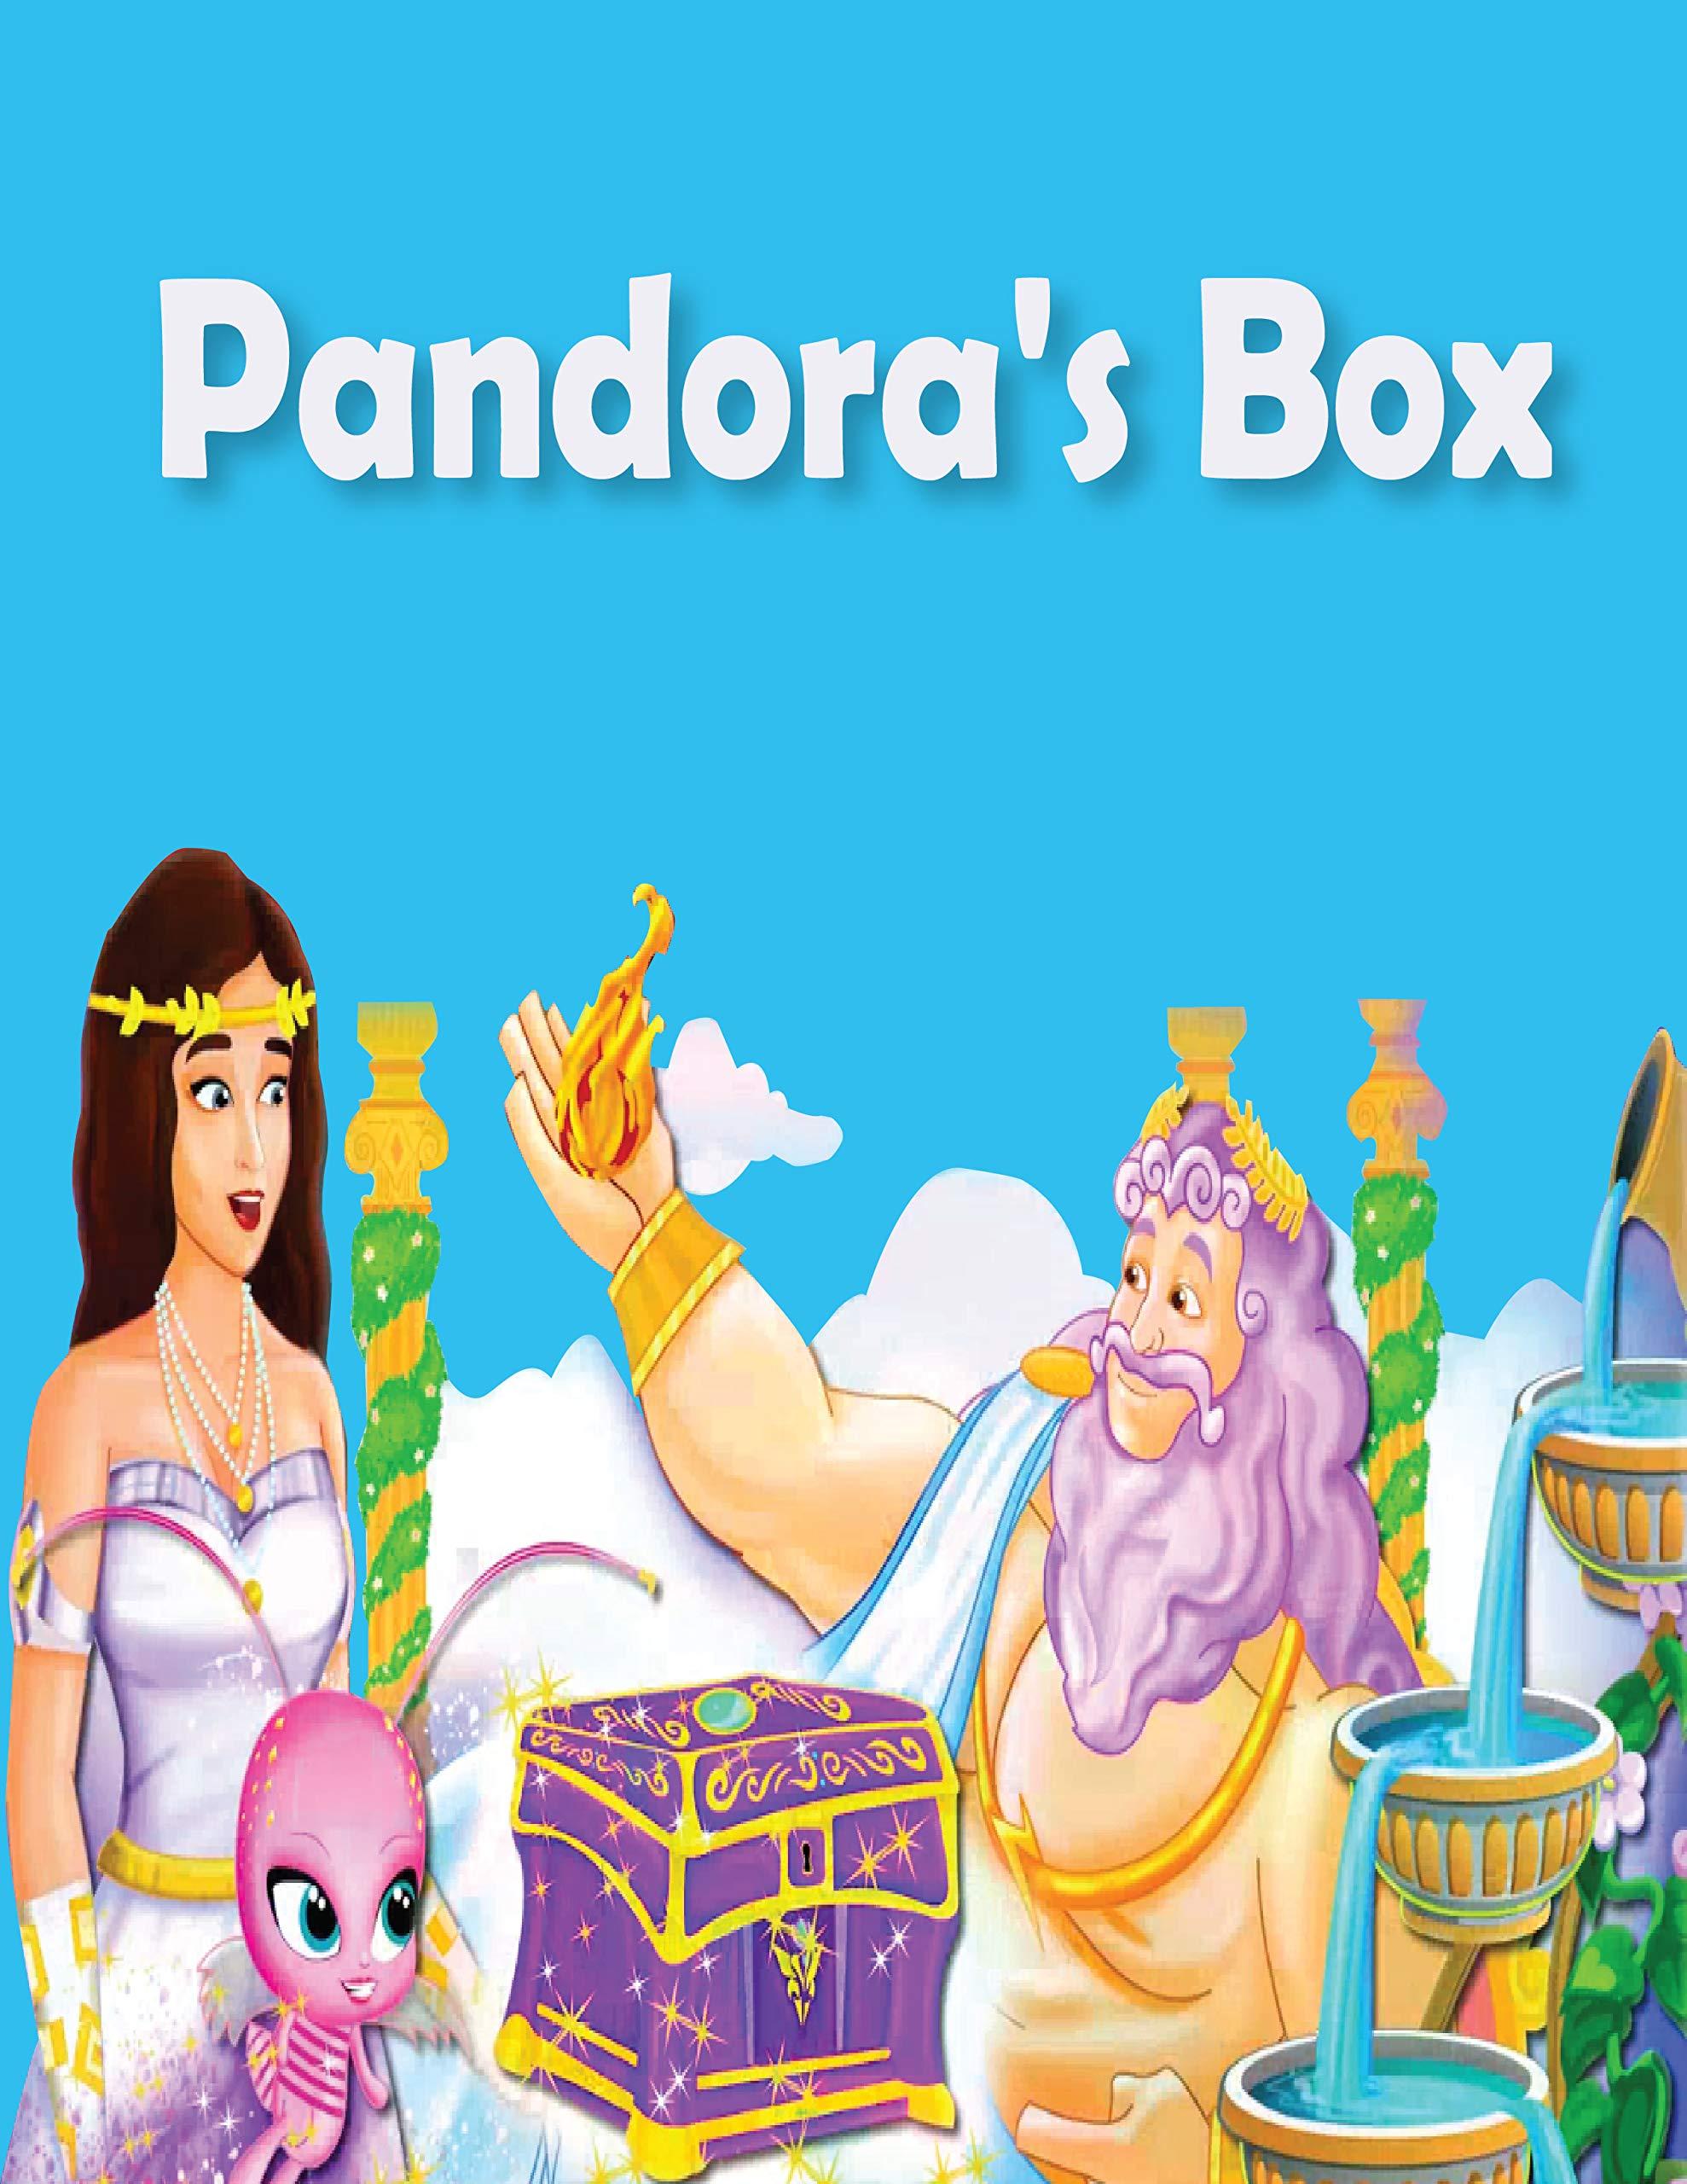 Pandora's Box: Bedtime Story For Kids | Classic Story For Kids | English Cartoon For Kids